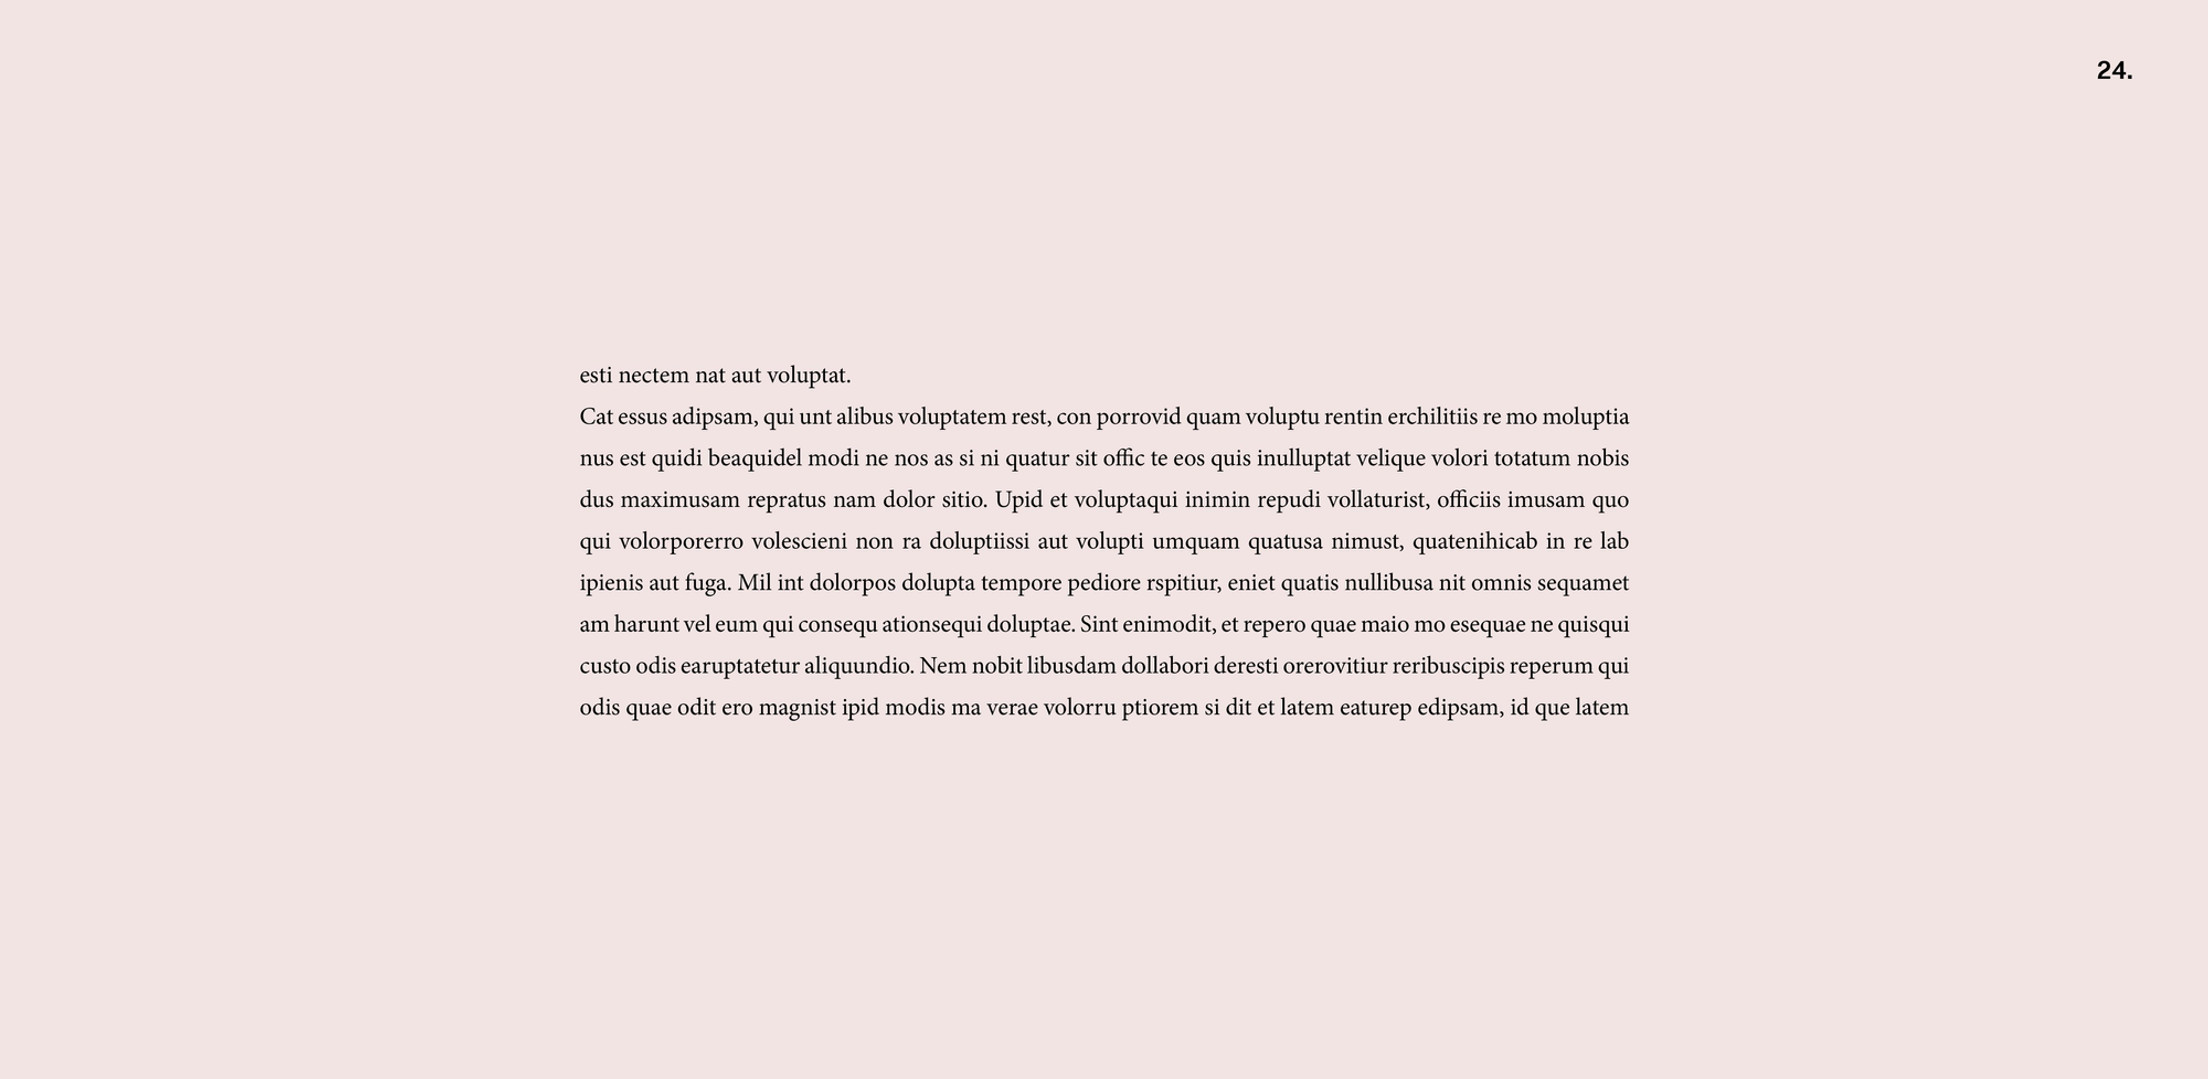 SC_DOVE_lorem ipsum-page-024.jpg